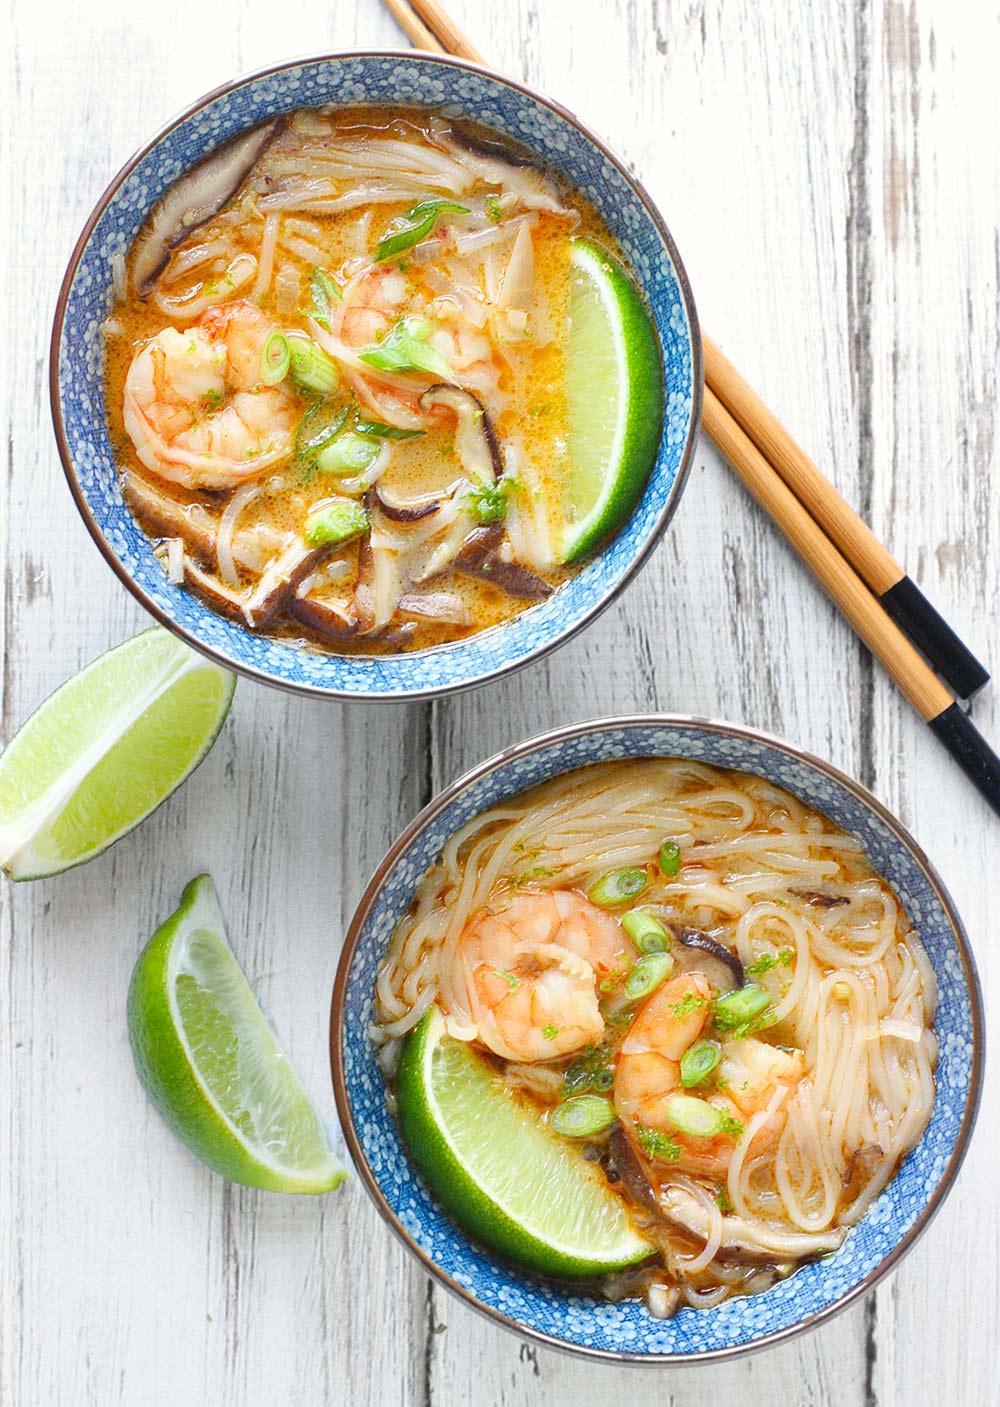 Shrimp Shiitake Curry Soup from SoupAddict.com